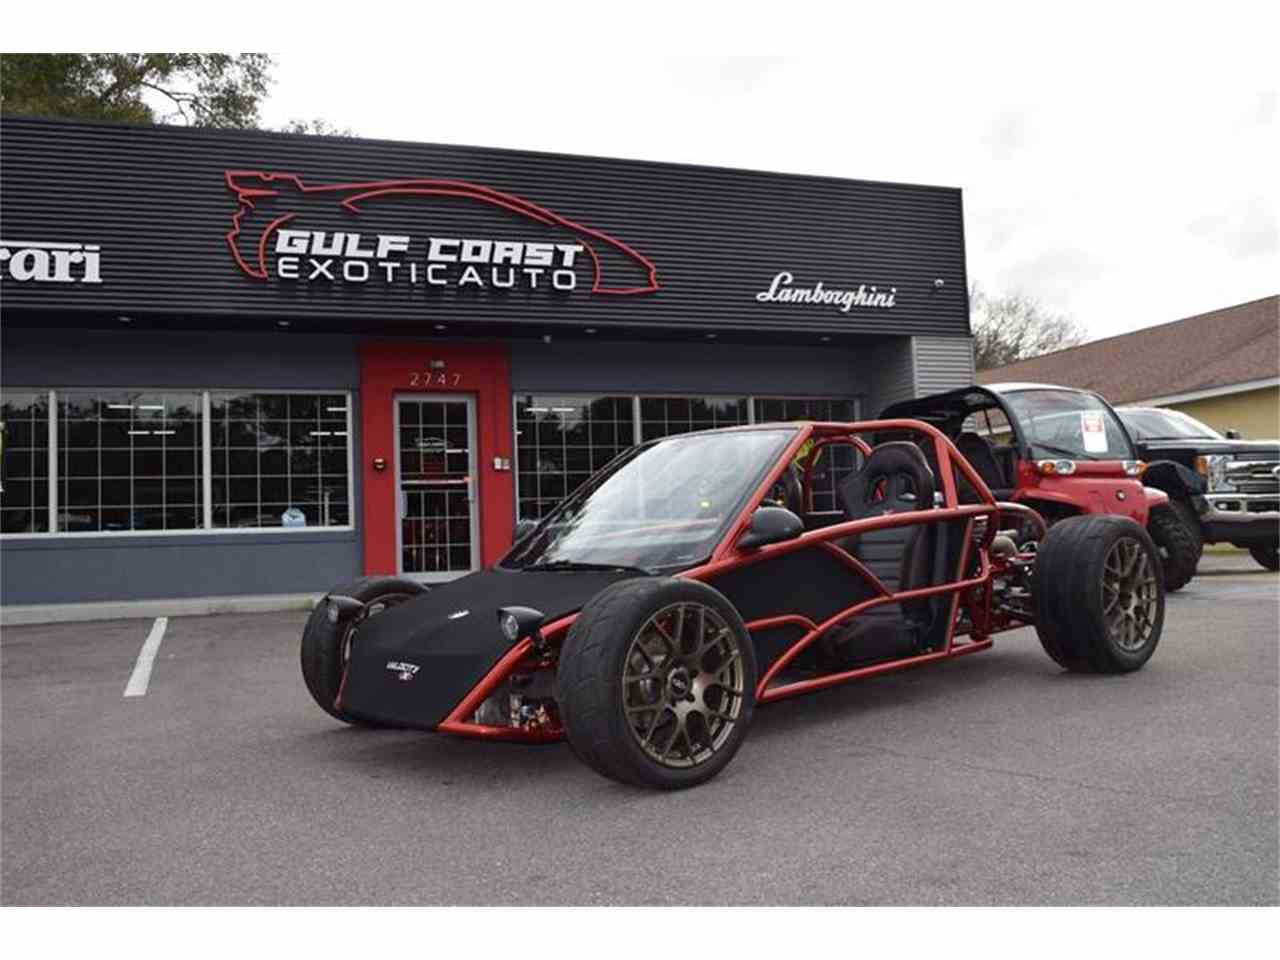 2017 Velocity EXO Custom Roadster for Sale | ClassicCars.com | CC ...